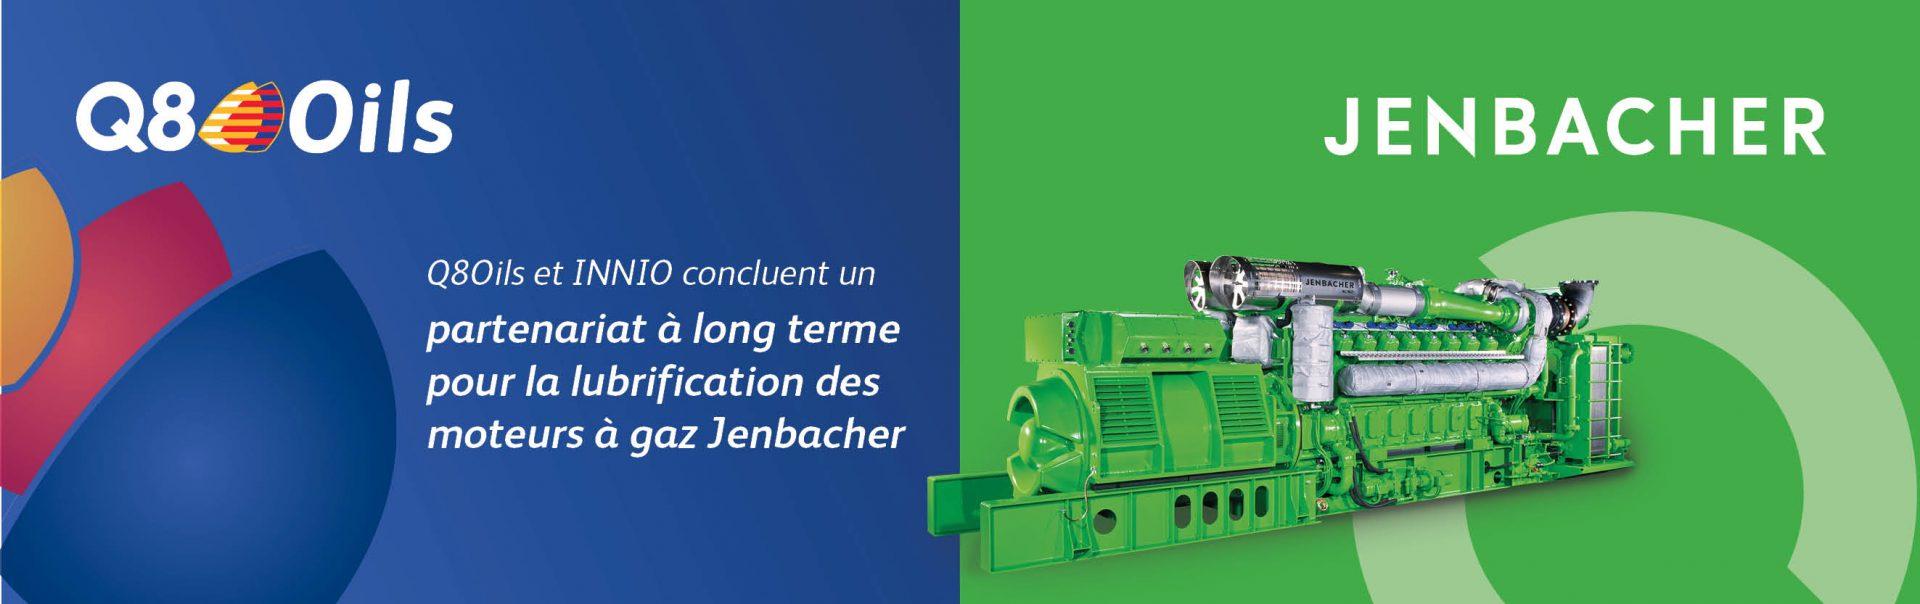 Q8Oils Jenbacher Homepage Fr